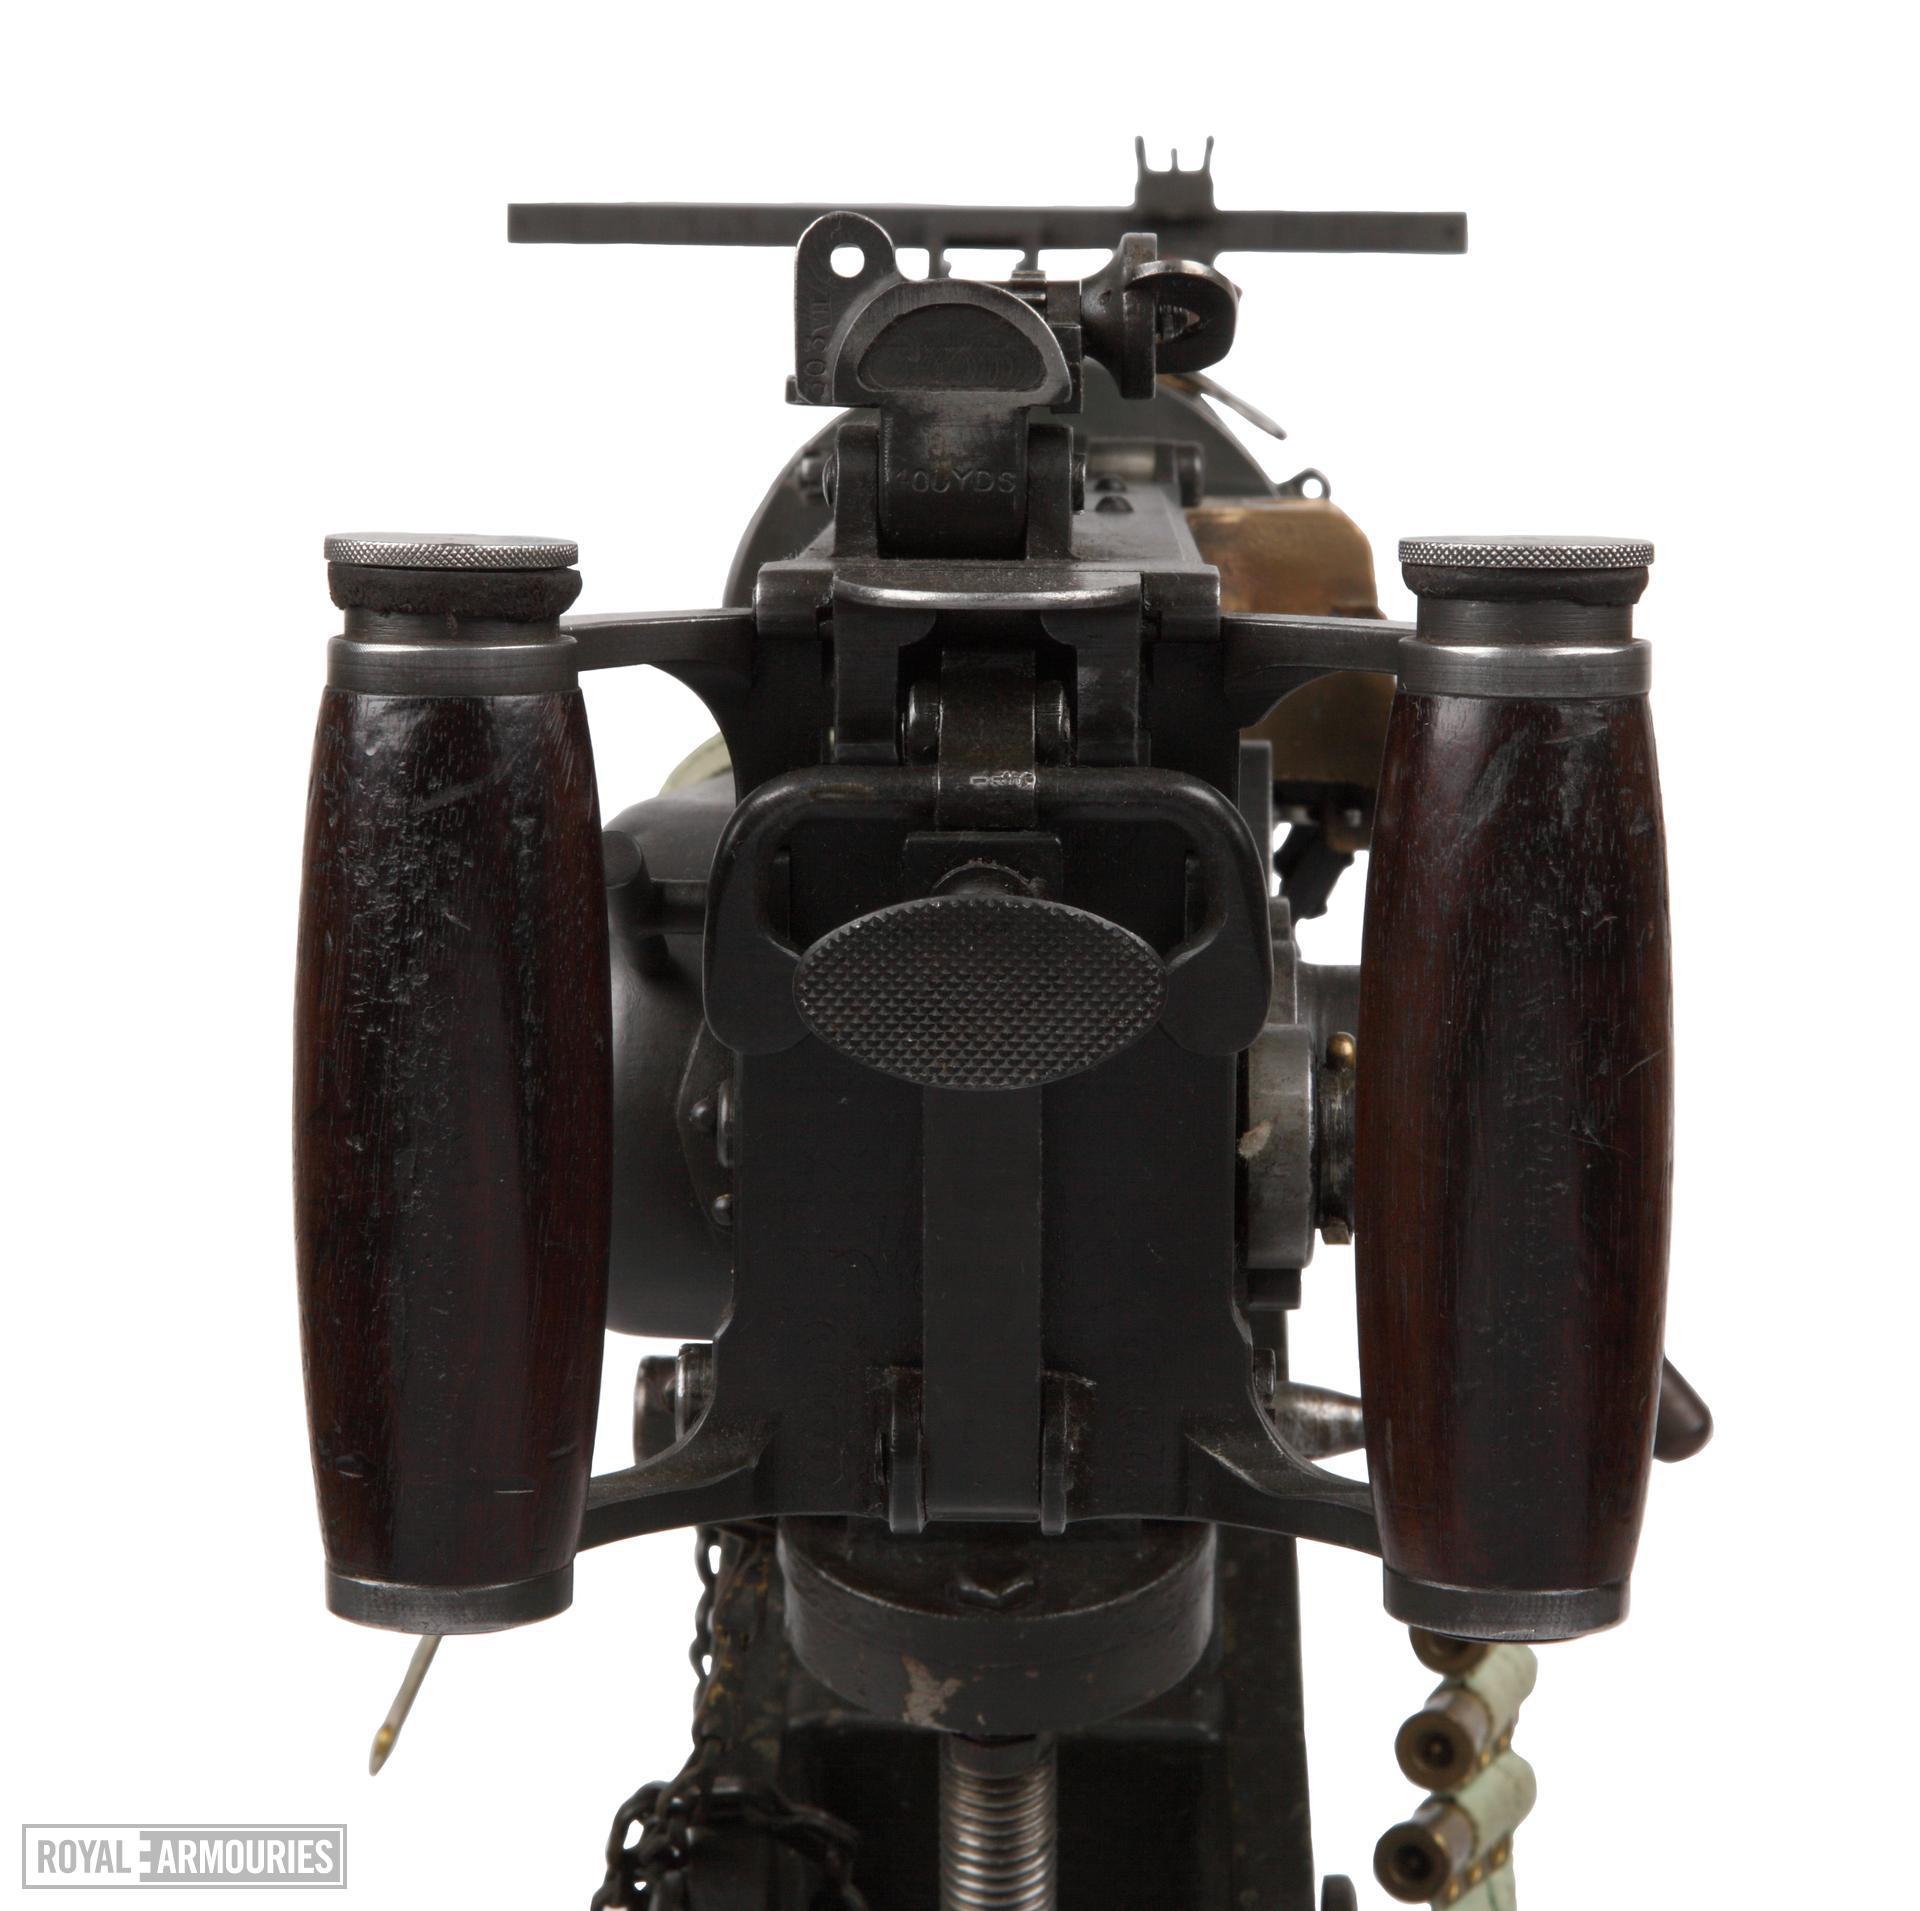 Vickers Mk.I belt-fed military machine gun, Australian, Lithgow, about 1944